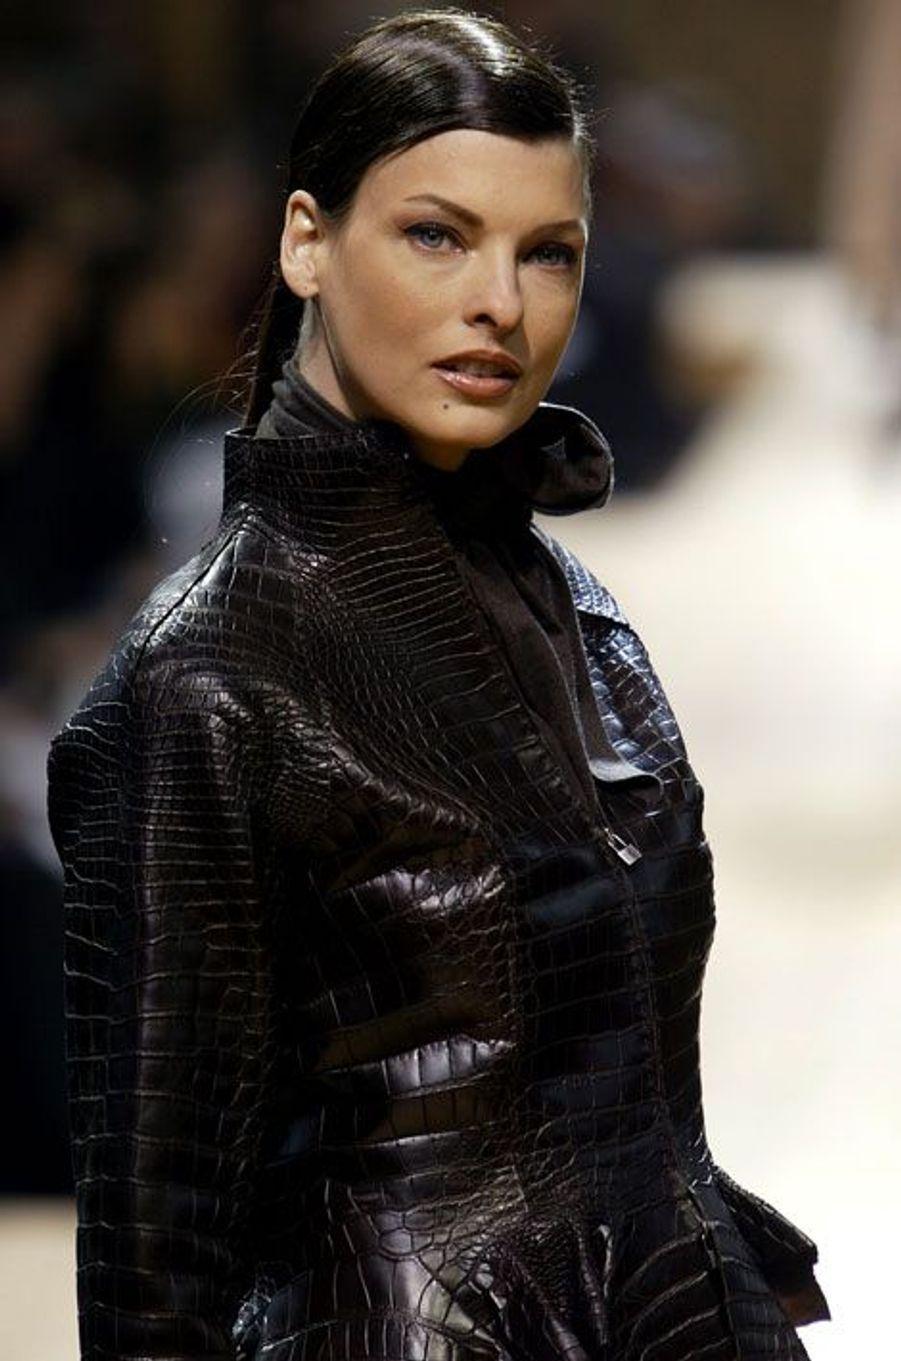 Linda Evangelista au défilé Automne-Hiver 2004-2005